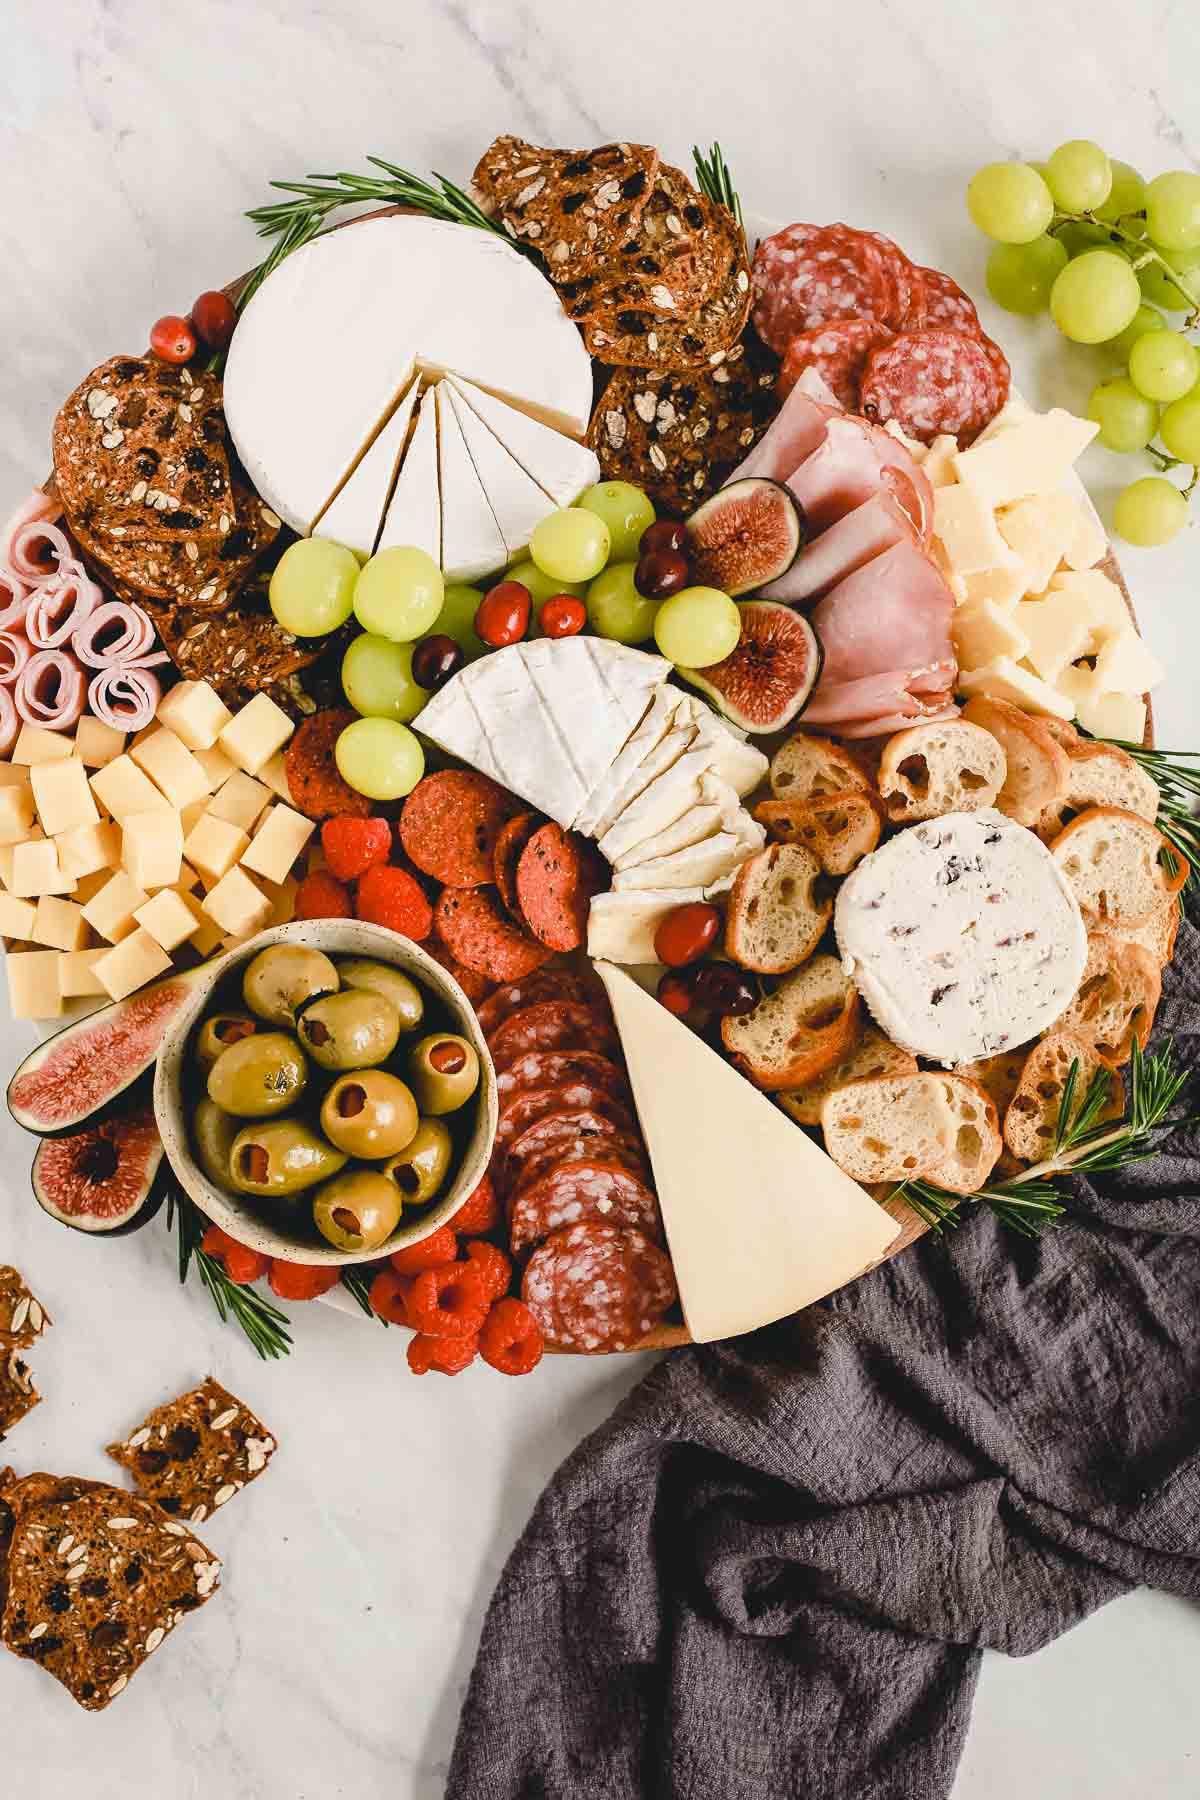 How To Make A Cheese Board Easy Quick Primavera Kitchen